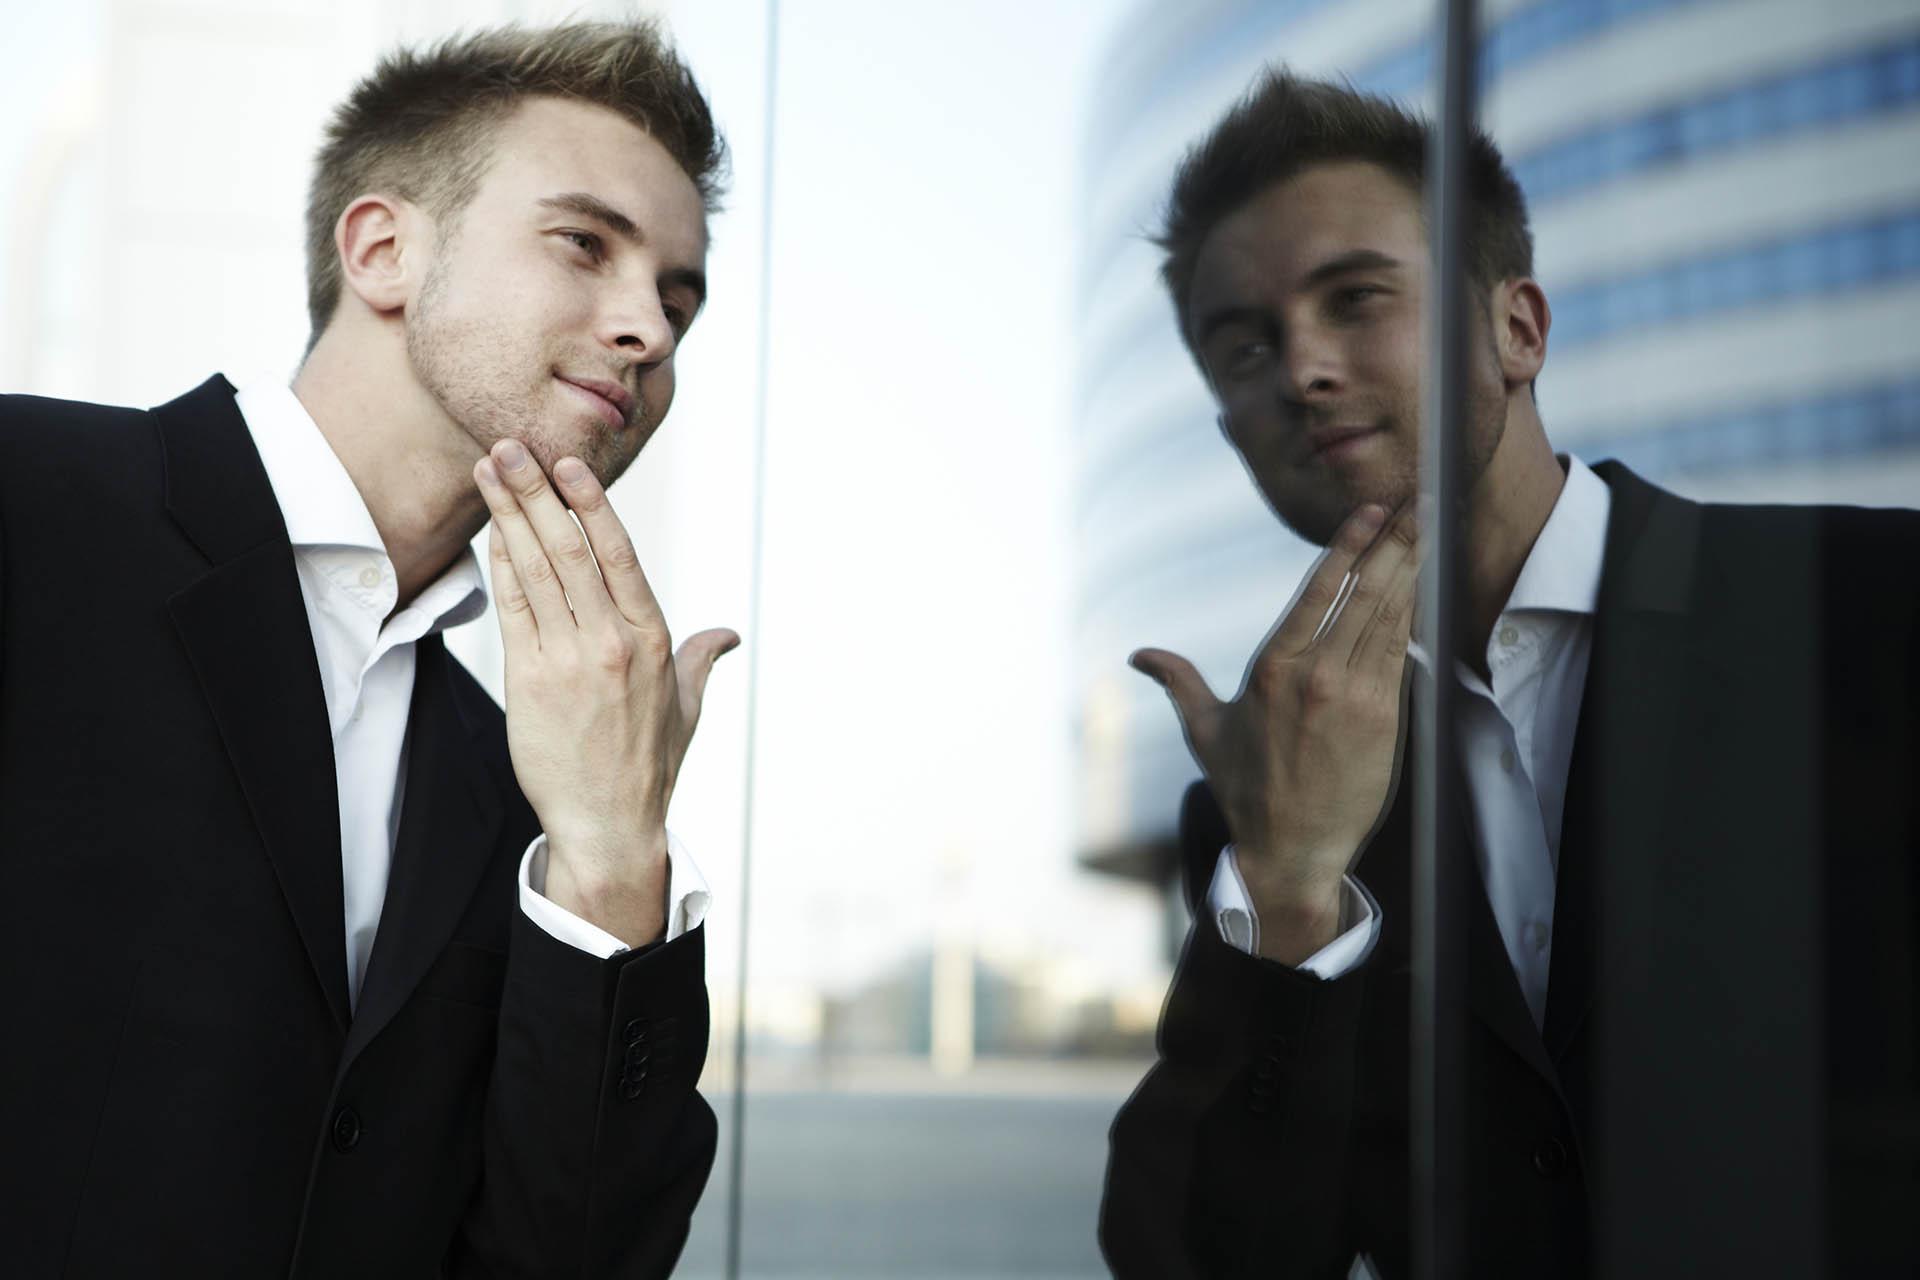 Вебинар: Бизнес как отражение собственника